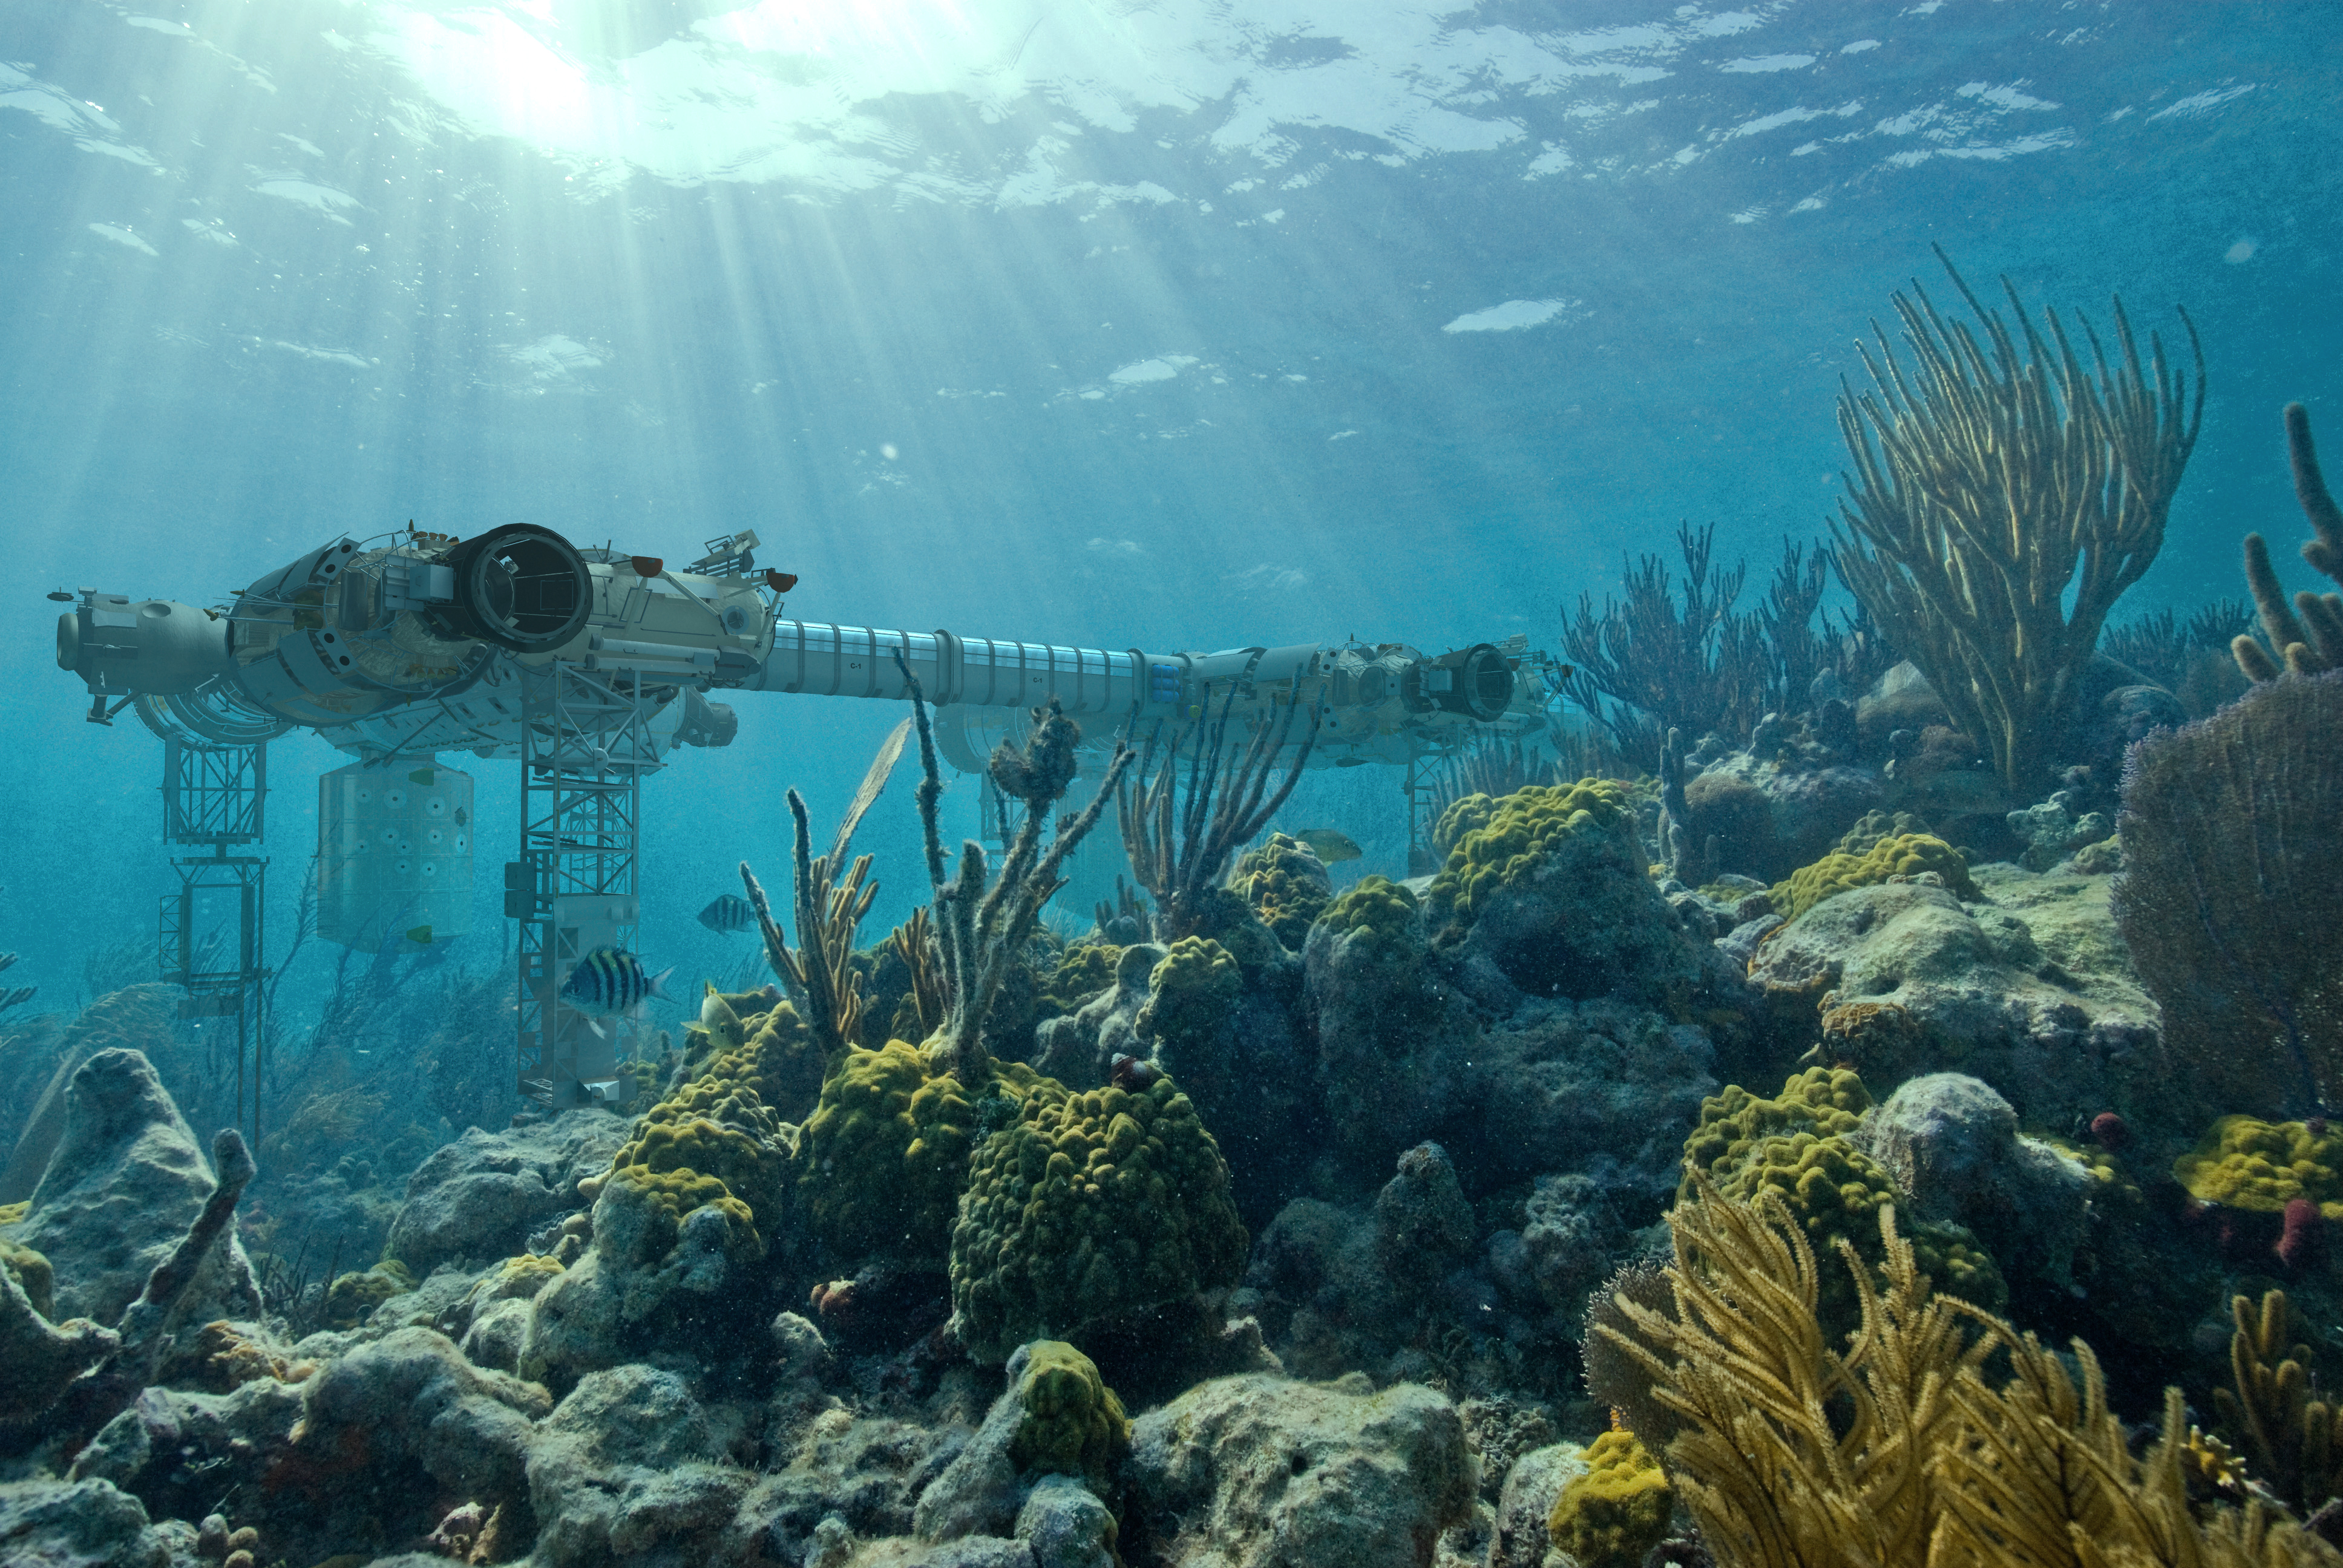 deep ocean Deep-sea (dēp′sē′) adj of, relating to, or taking place in the deeper parts of the sea: deep-sea exploration deep-sea n (modifier) of, found in, or characteristic of the deep parts of the sea: deep-sea fishing deep′-sea′ adj of, pertaining to, or associated with the deeper parts of the sea: deep-sea fishing [1620–30.